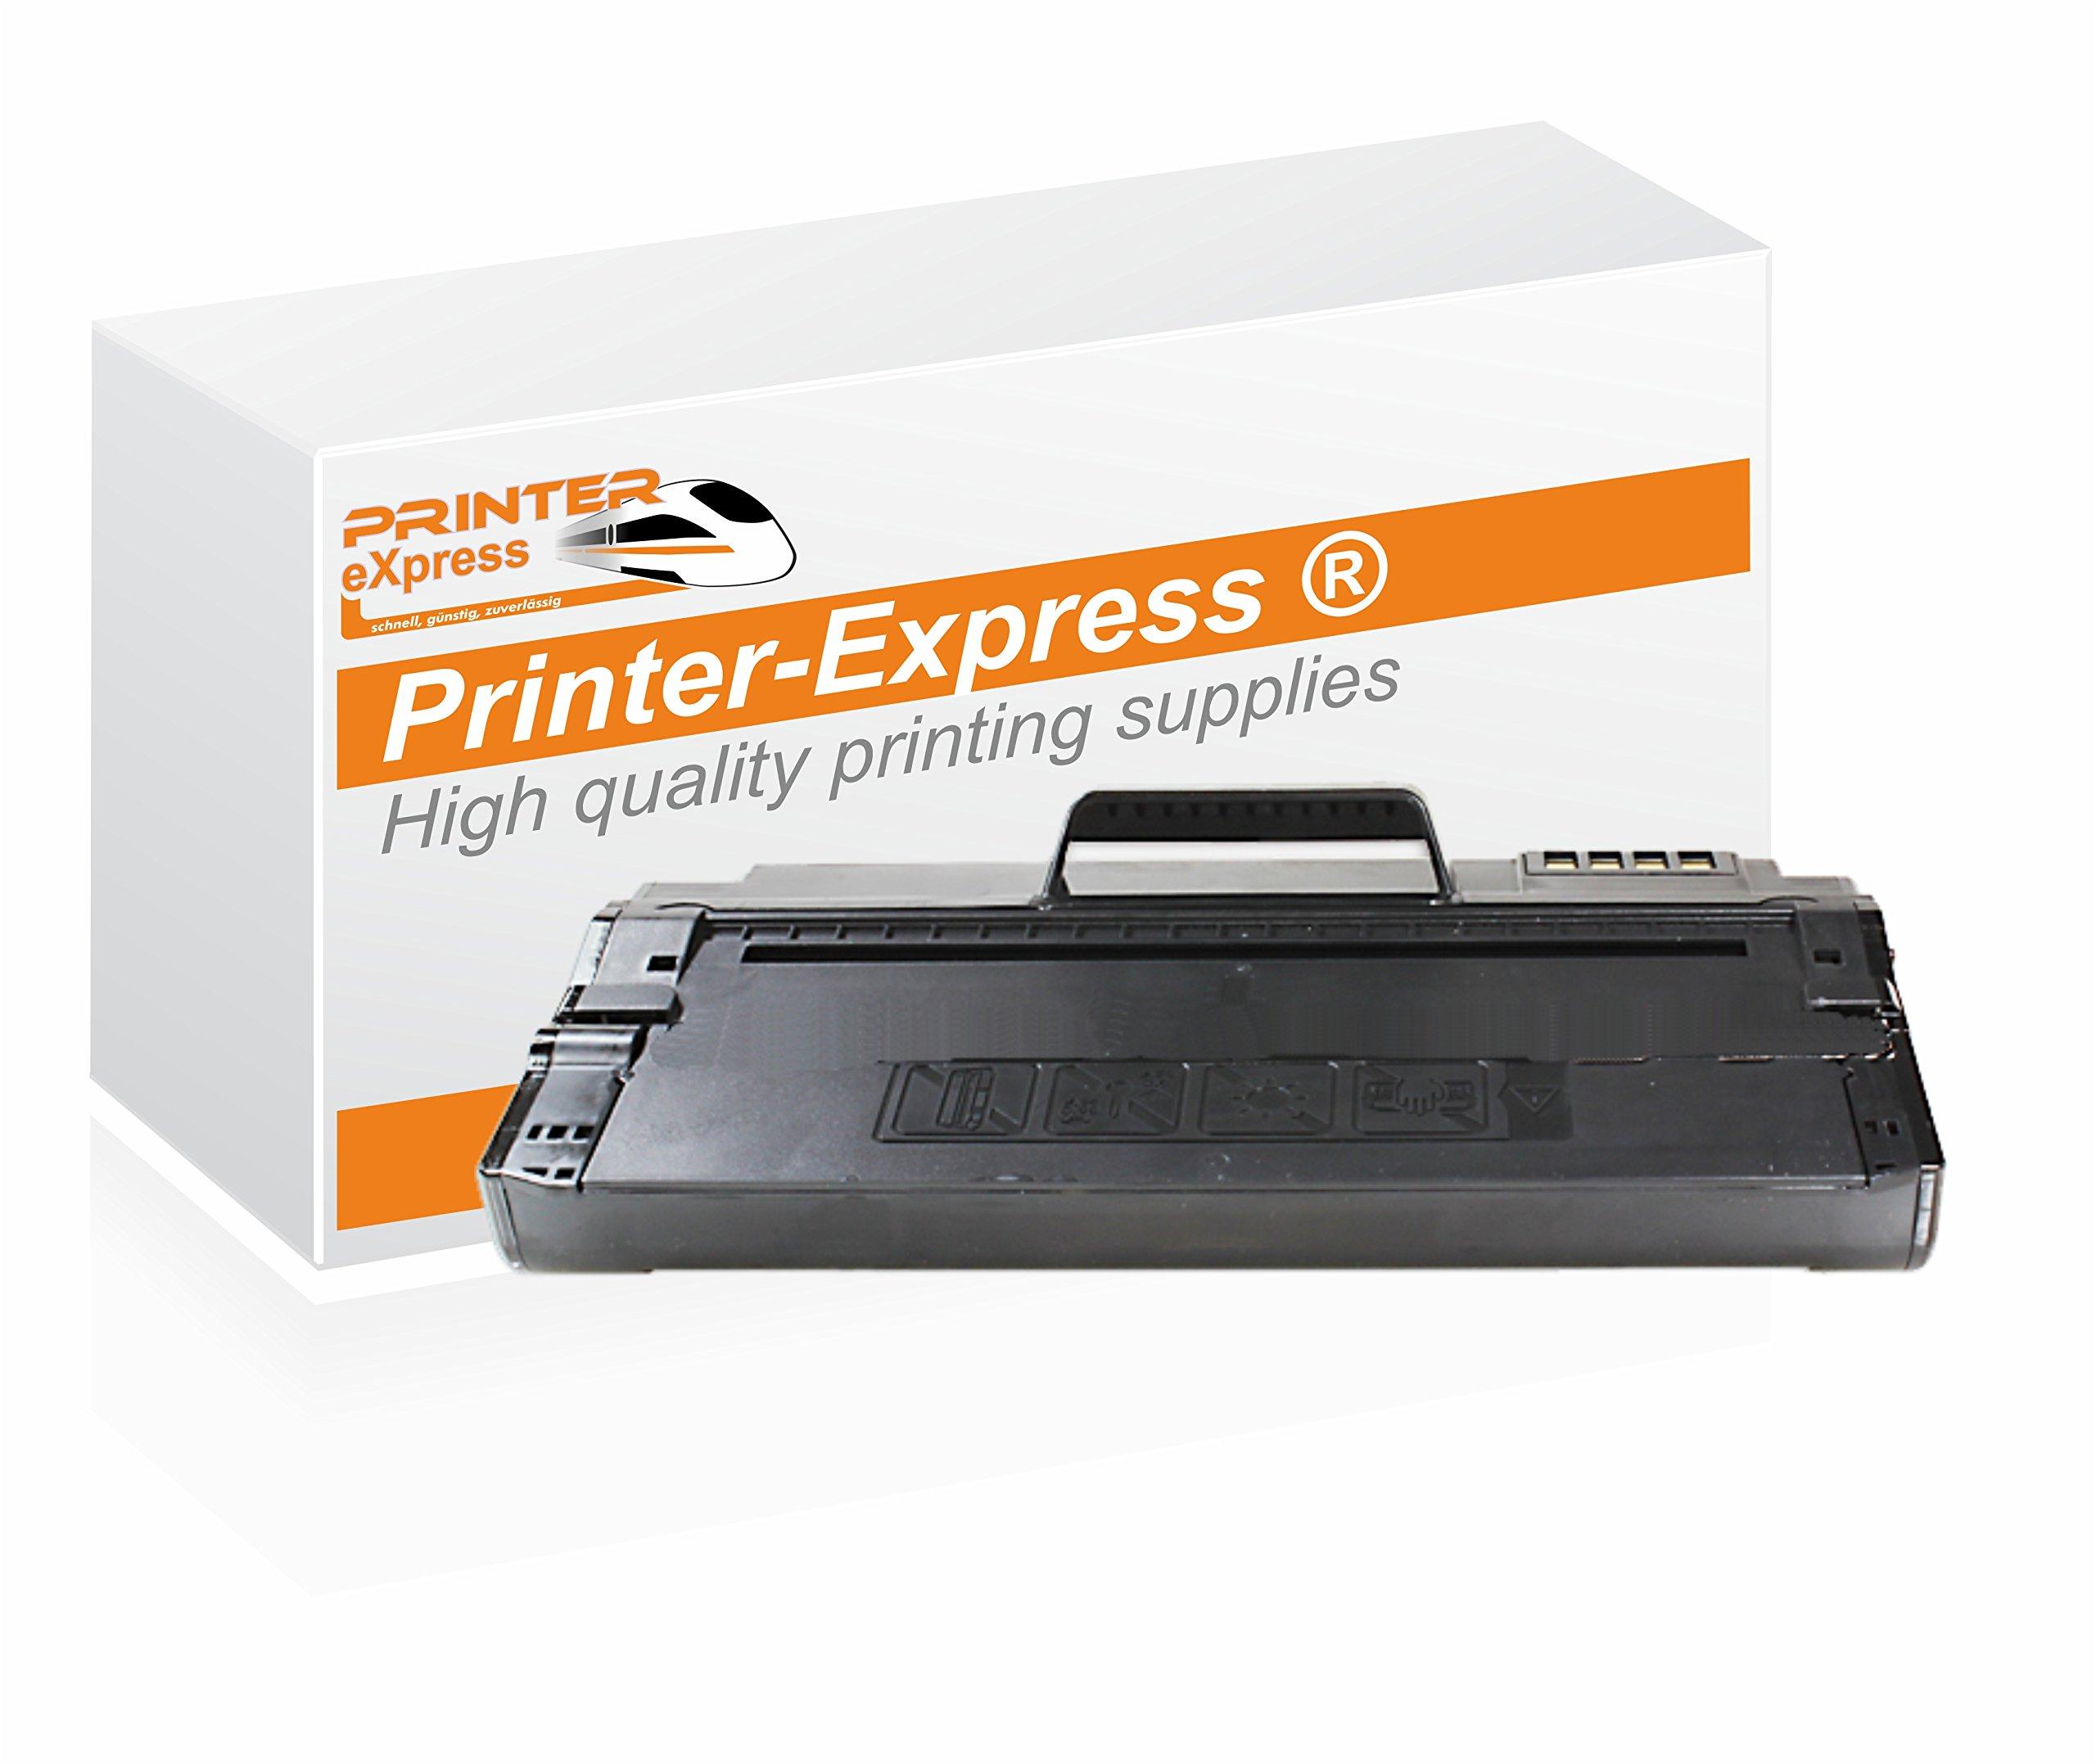 Printer-Express-XL-Toner-ersetzt-Samsung-SCX-4500-ML-D1630A-ML-D1630AELS-fr-Samsung-ML-1630-ML-1631-SCX-4500-Drucker-Schwarz